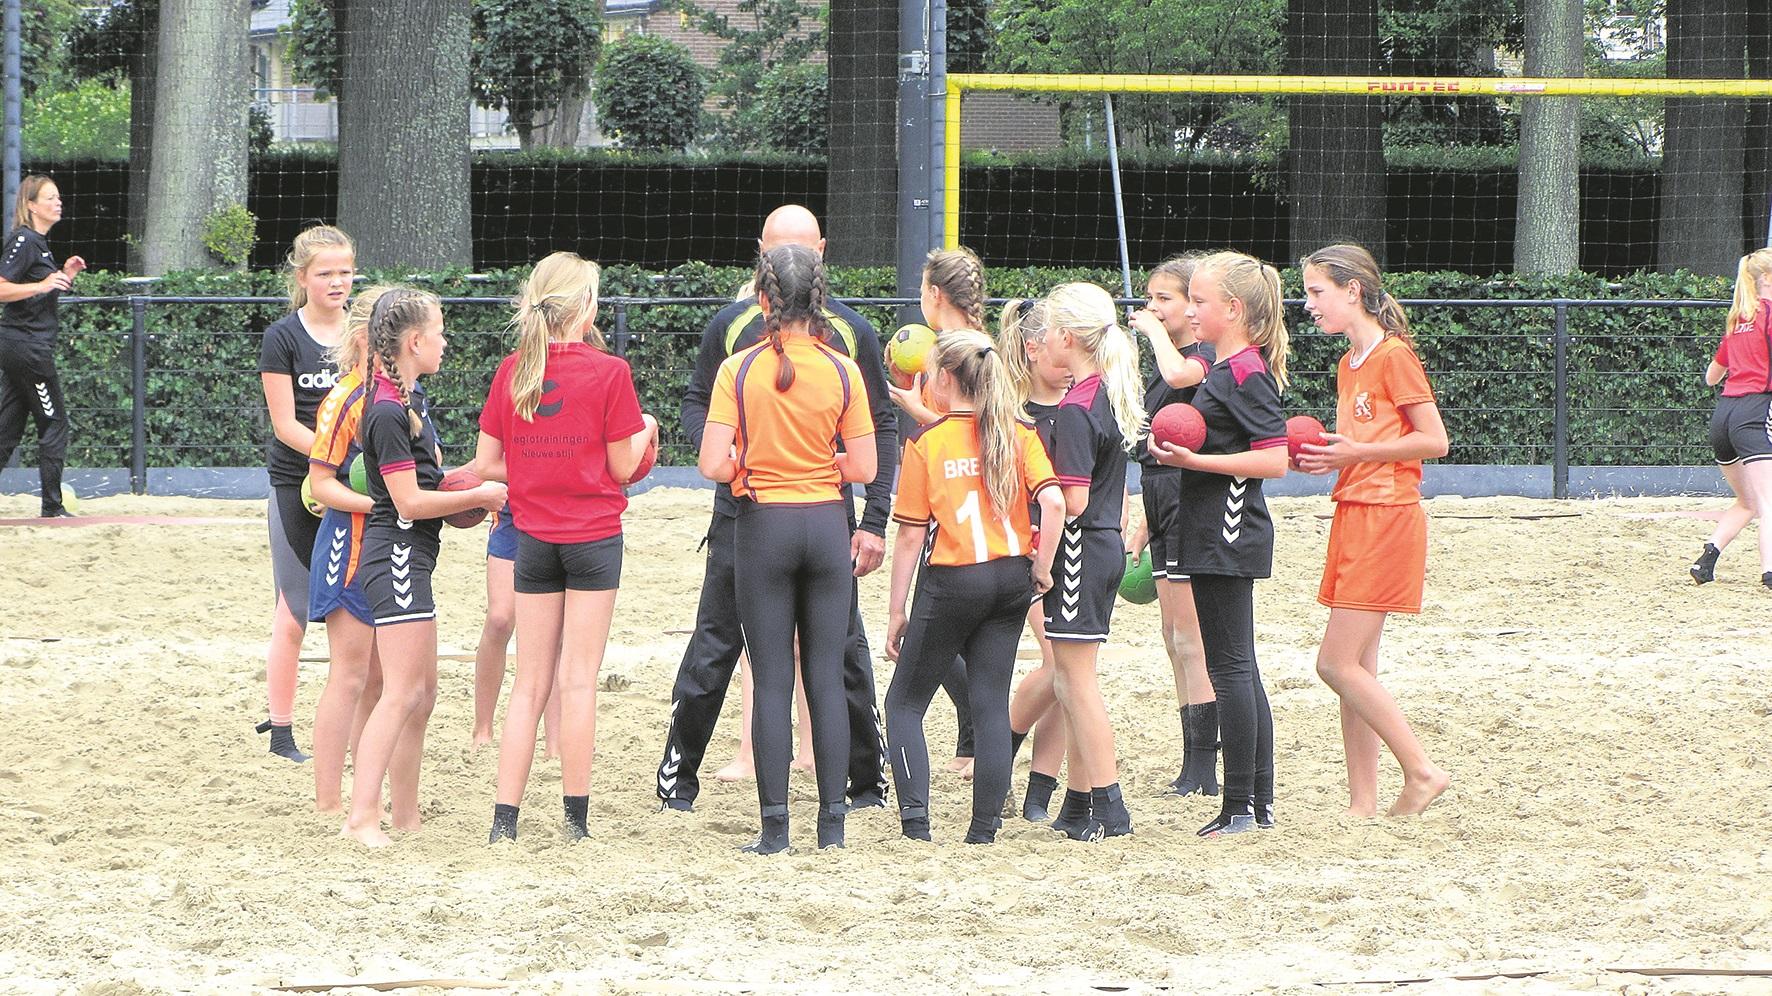 Samenwerking met clubs stap voorwaarts